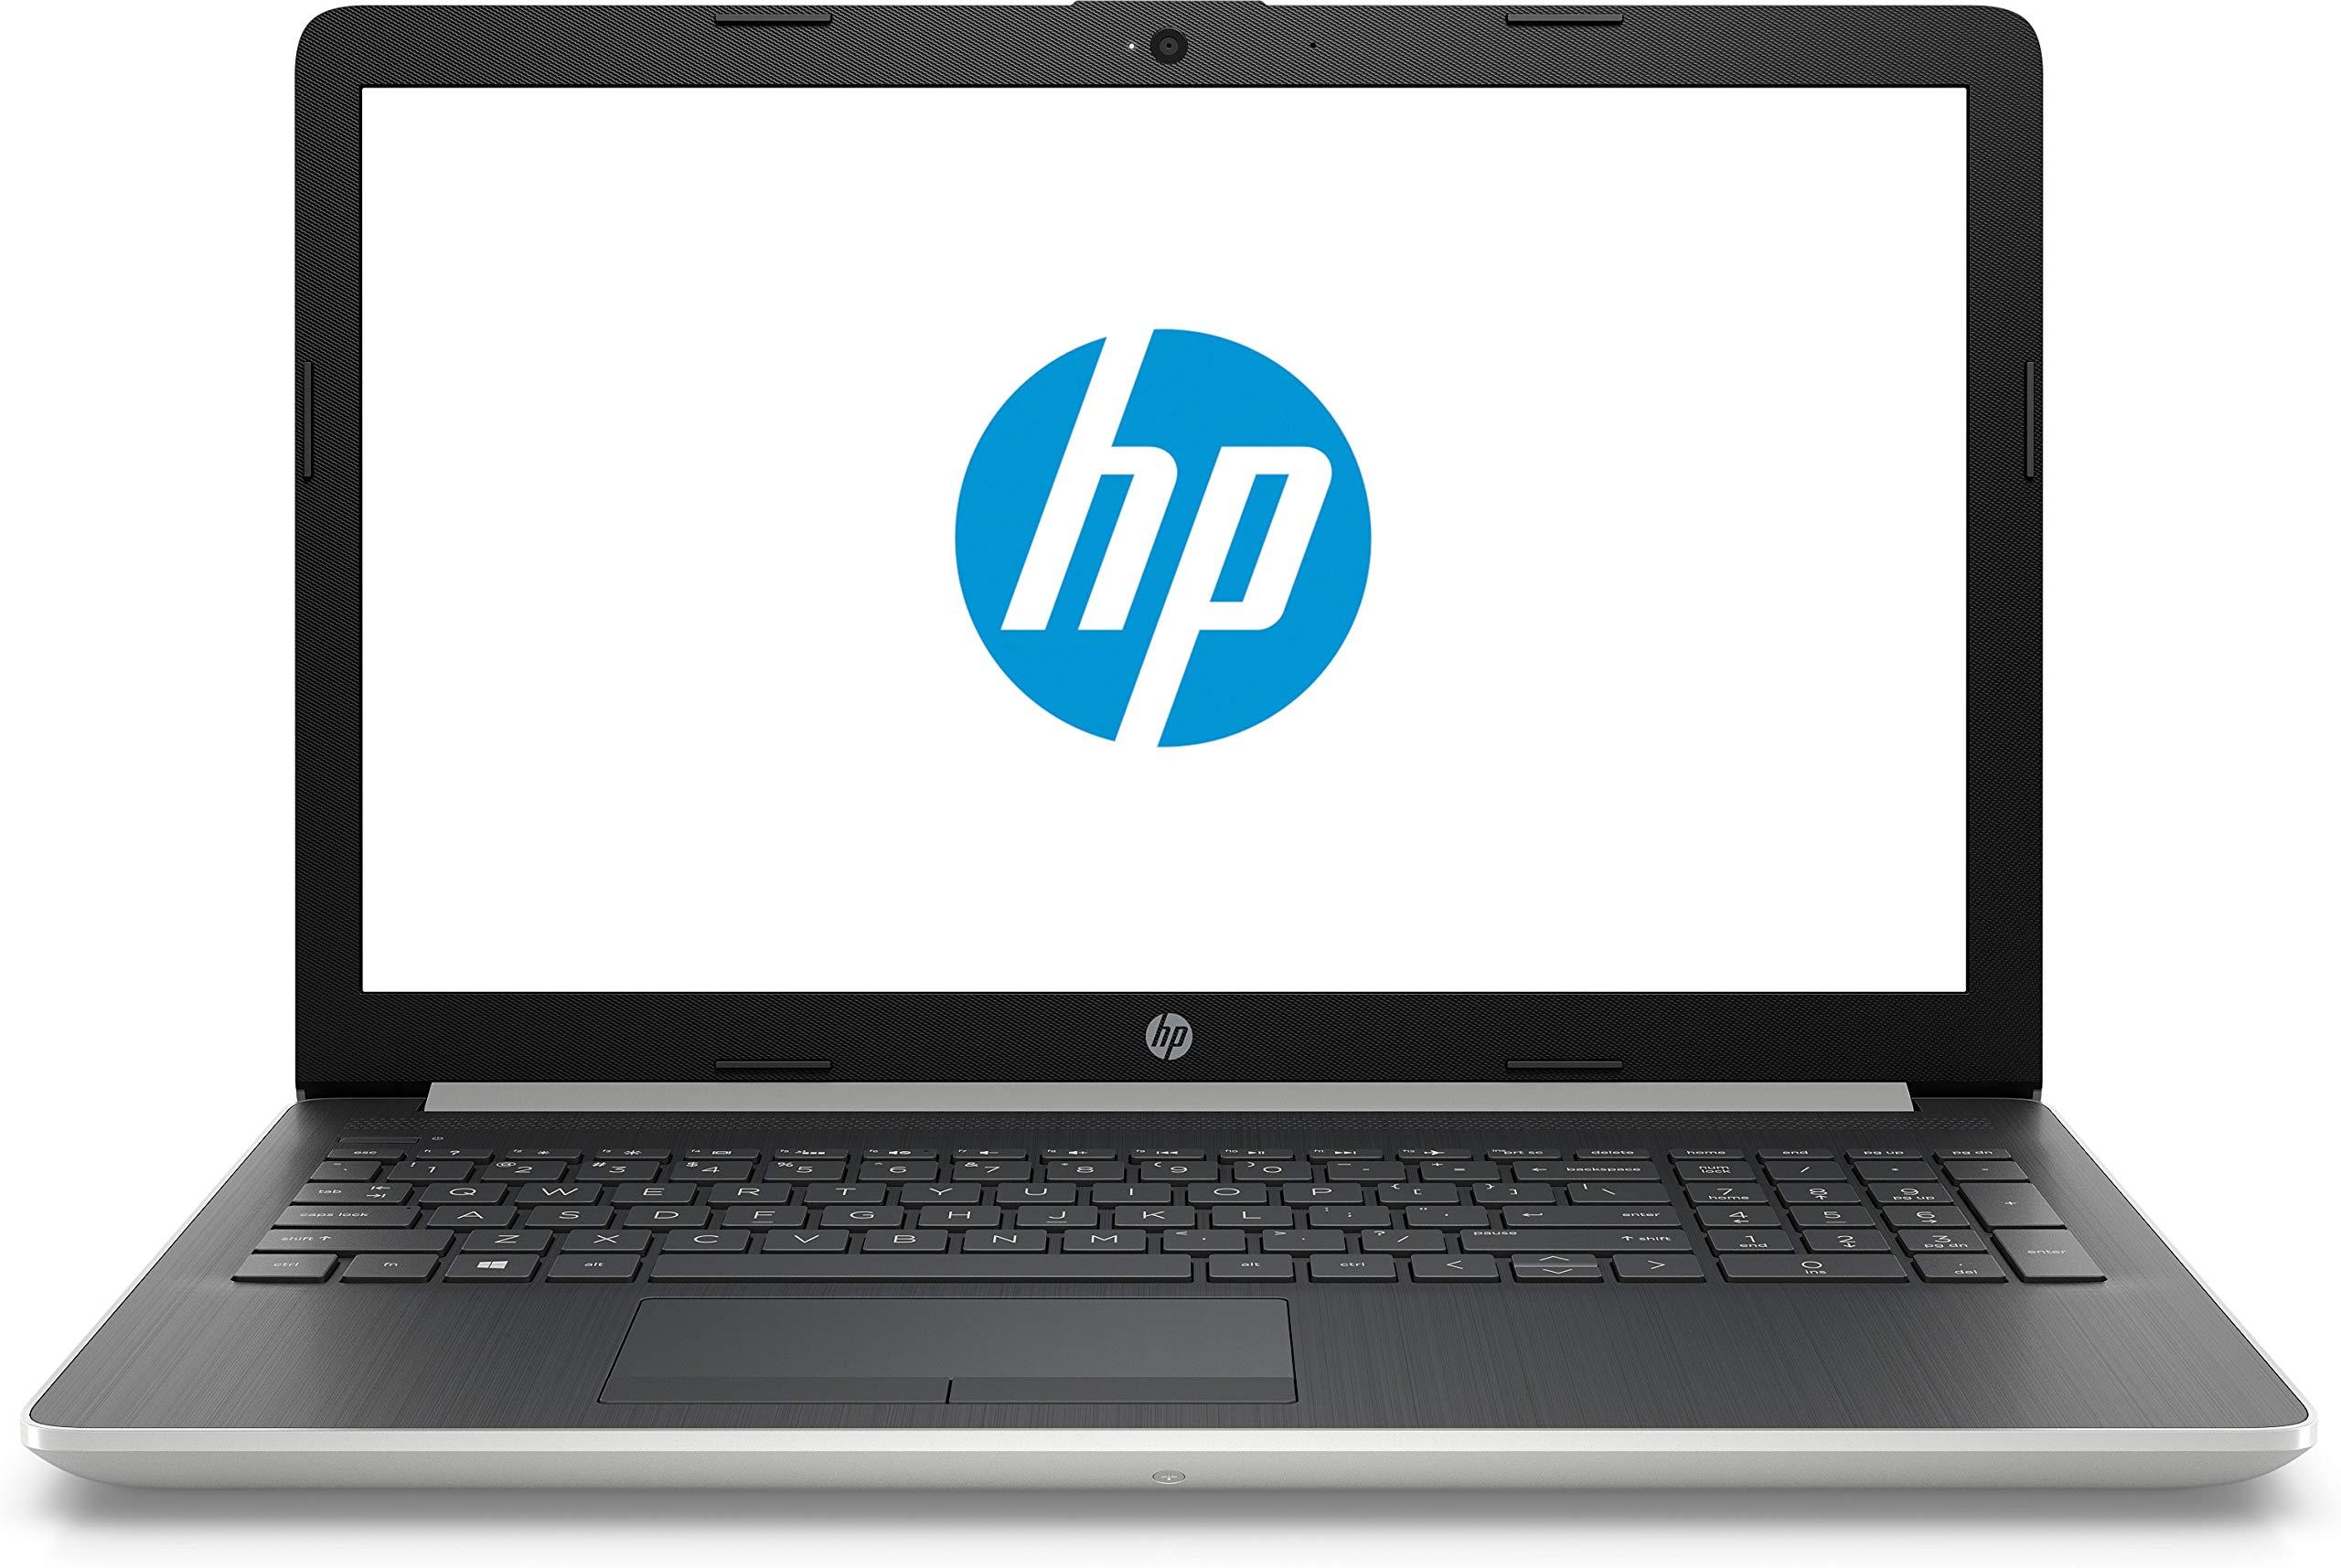 "2019 Newest HP 15.6"" Touchscreen Laptop, Intel Quad-Core i5-8250U, 8GB DDR4 RAM, 128GB SSD, HDMI, DVDRW, Bluetooth, Webcam, WiFi, Win 10 Home"